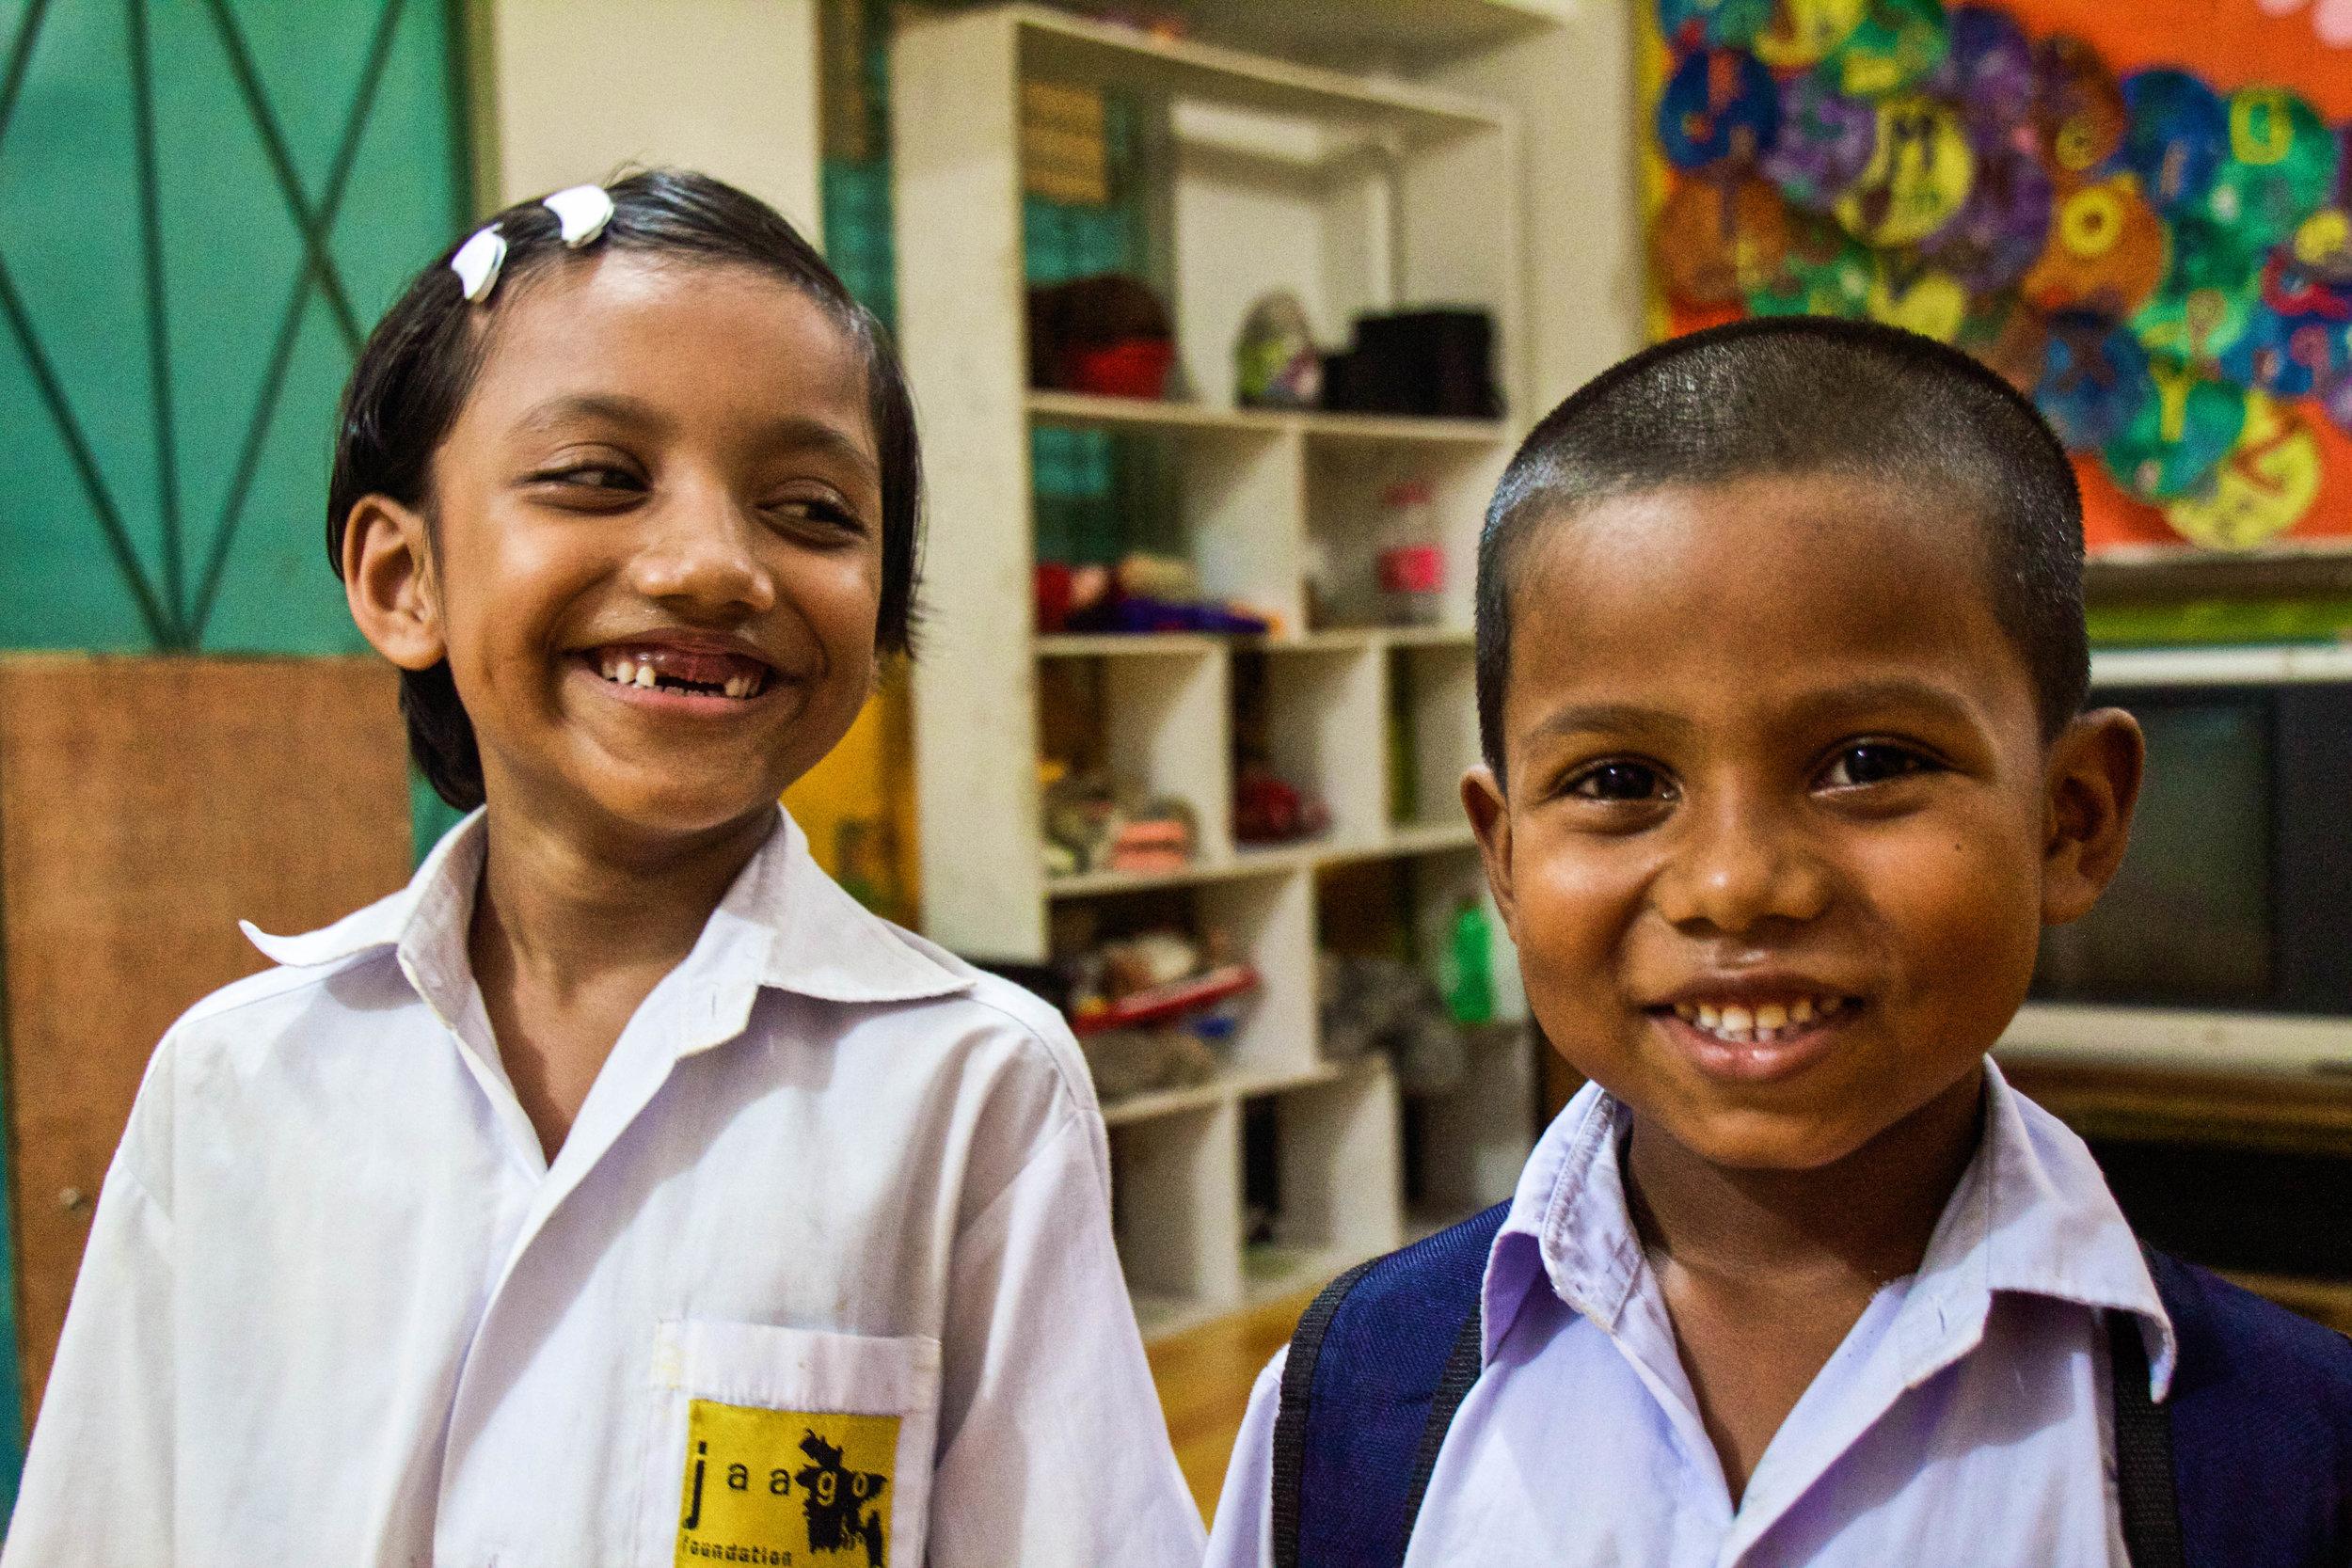 dhaka bangladesh jaago school children-6-6.jpg